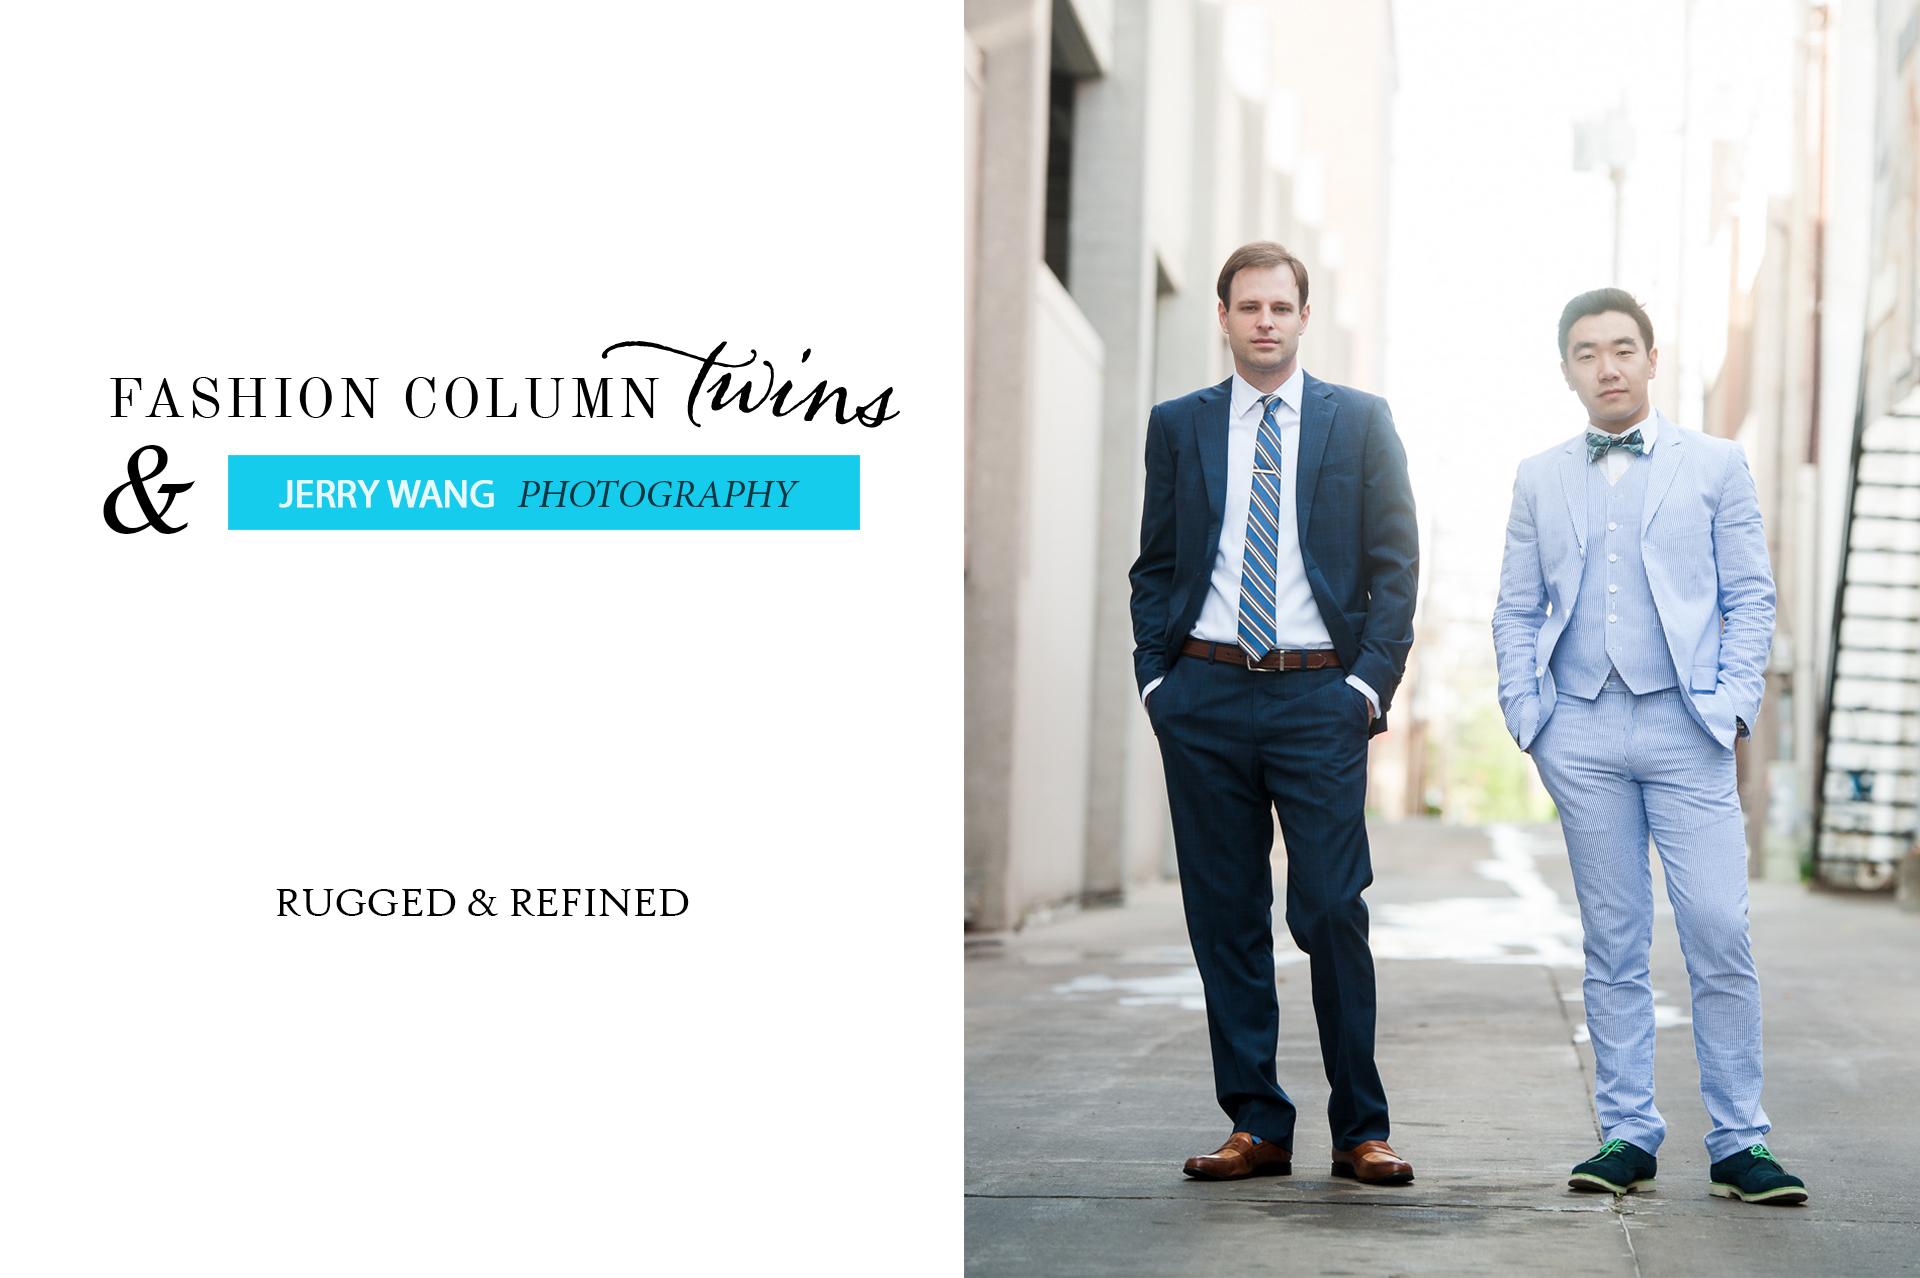 fashion-column-twins-mens-fashion-jerry-wang-photography-suits-seersucker-suit-formal-suit